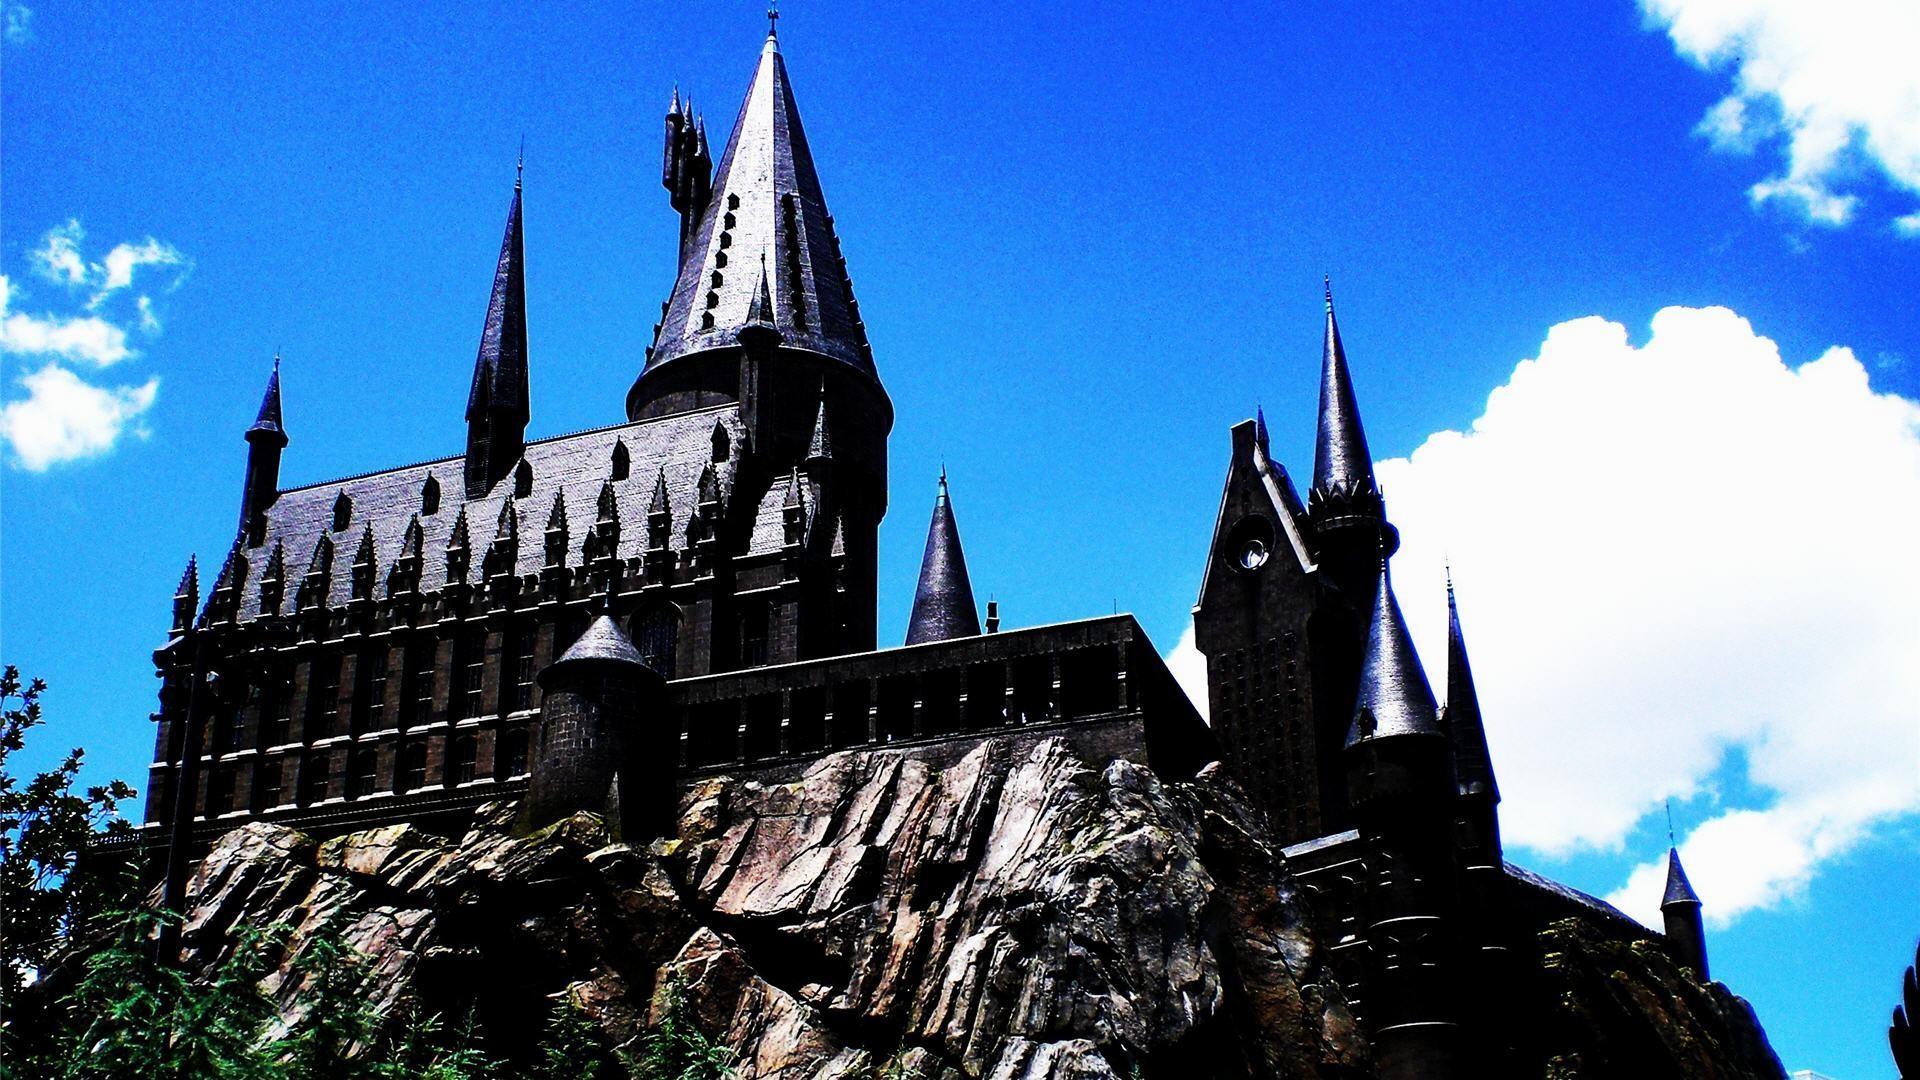 wallpaper.wiki-Hogwarts-Castle-HD-Backgrounds-PIC-WPE007367